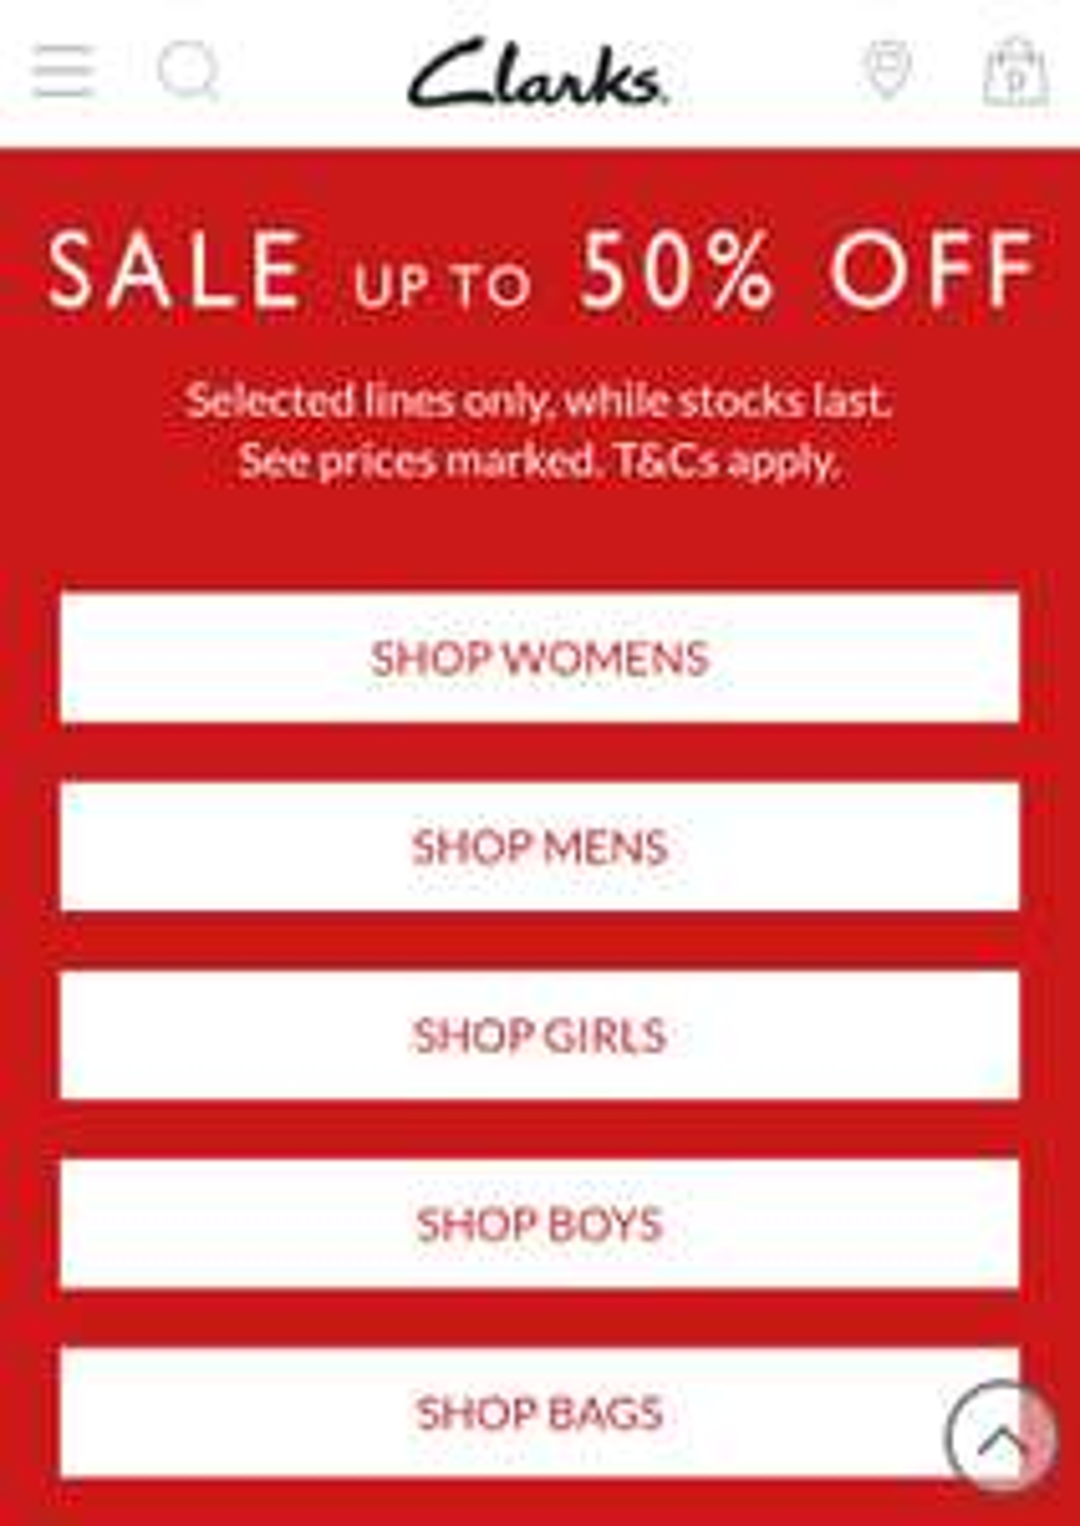 Clarks Christmas Sale